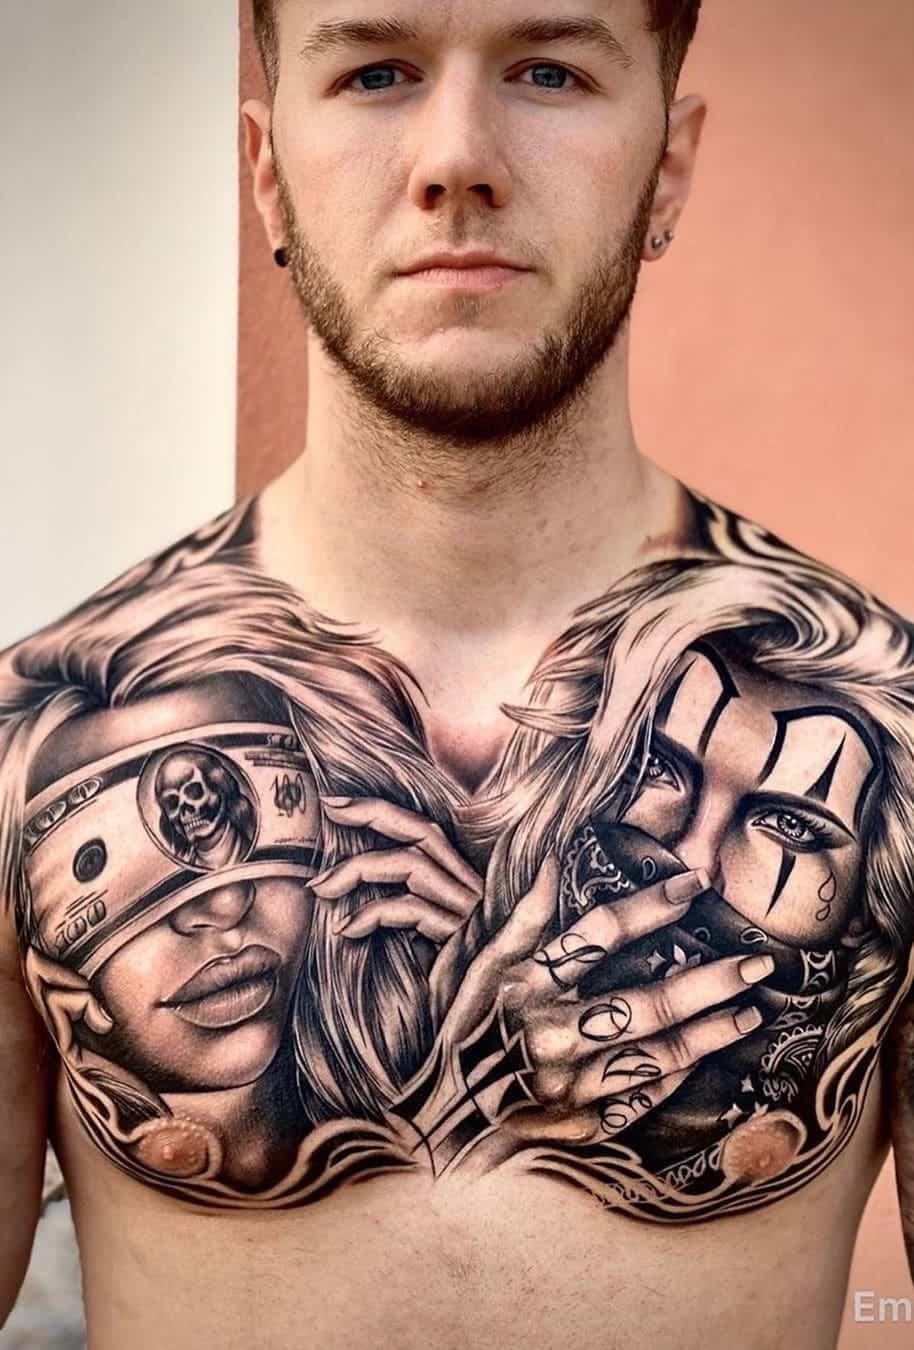 tatuagens-masculinas-no-peito-8